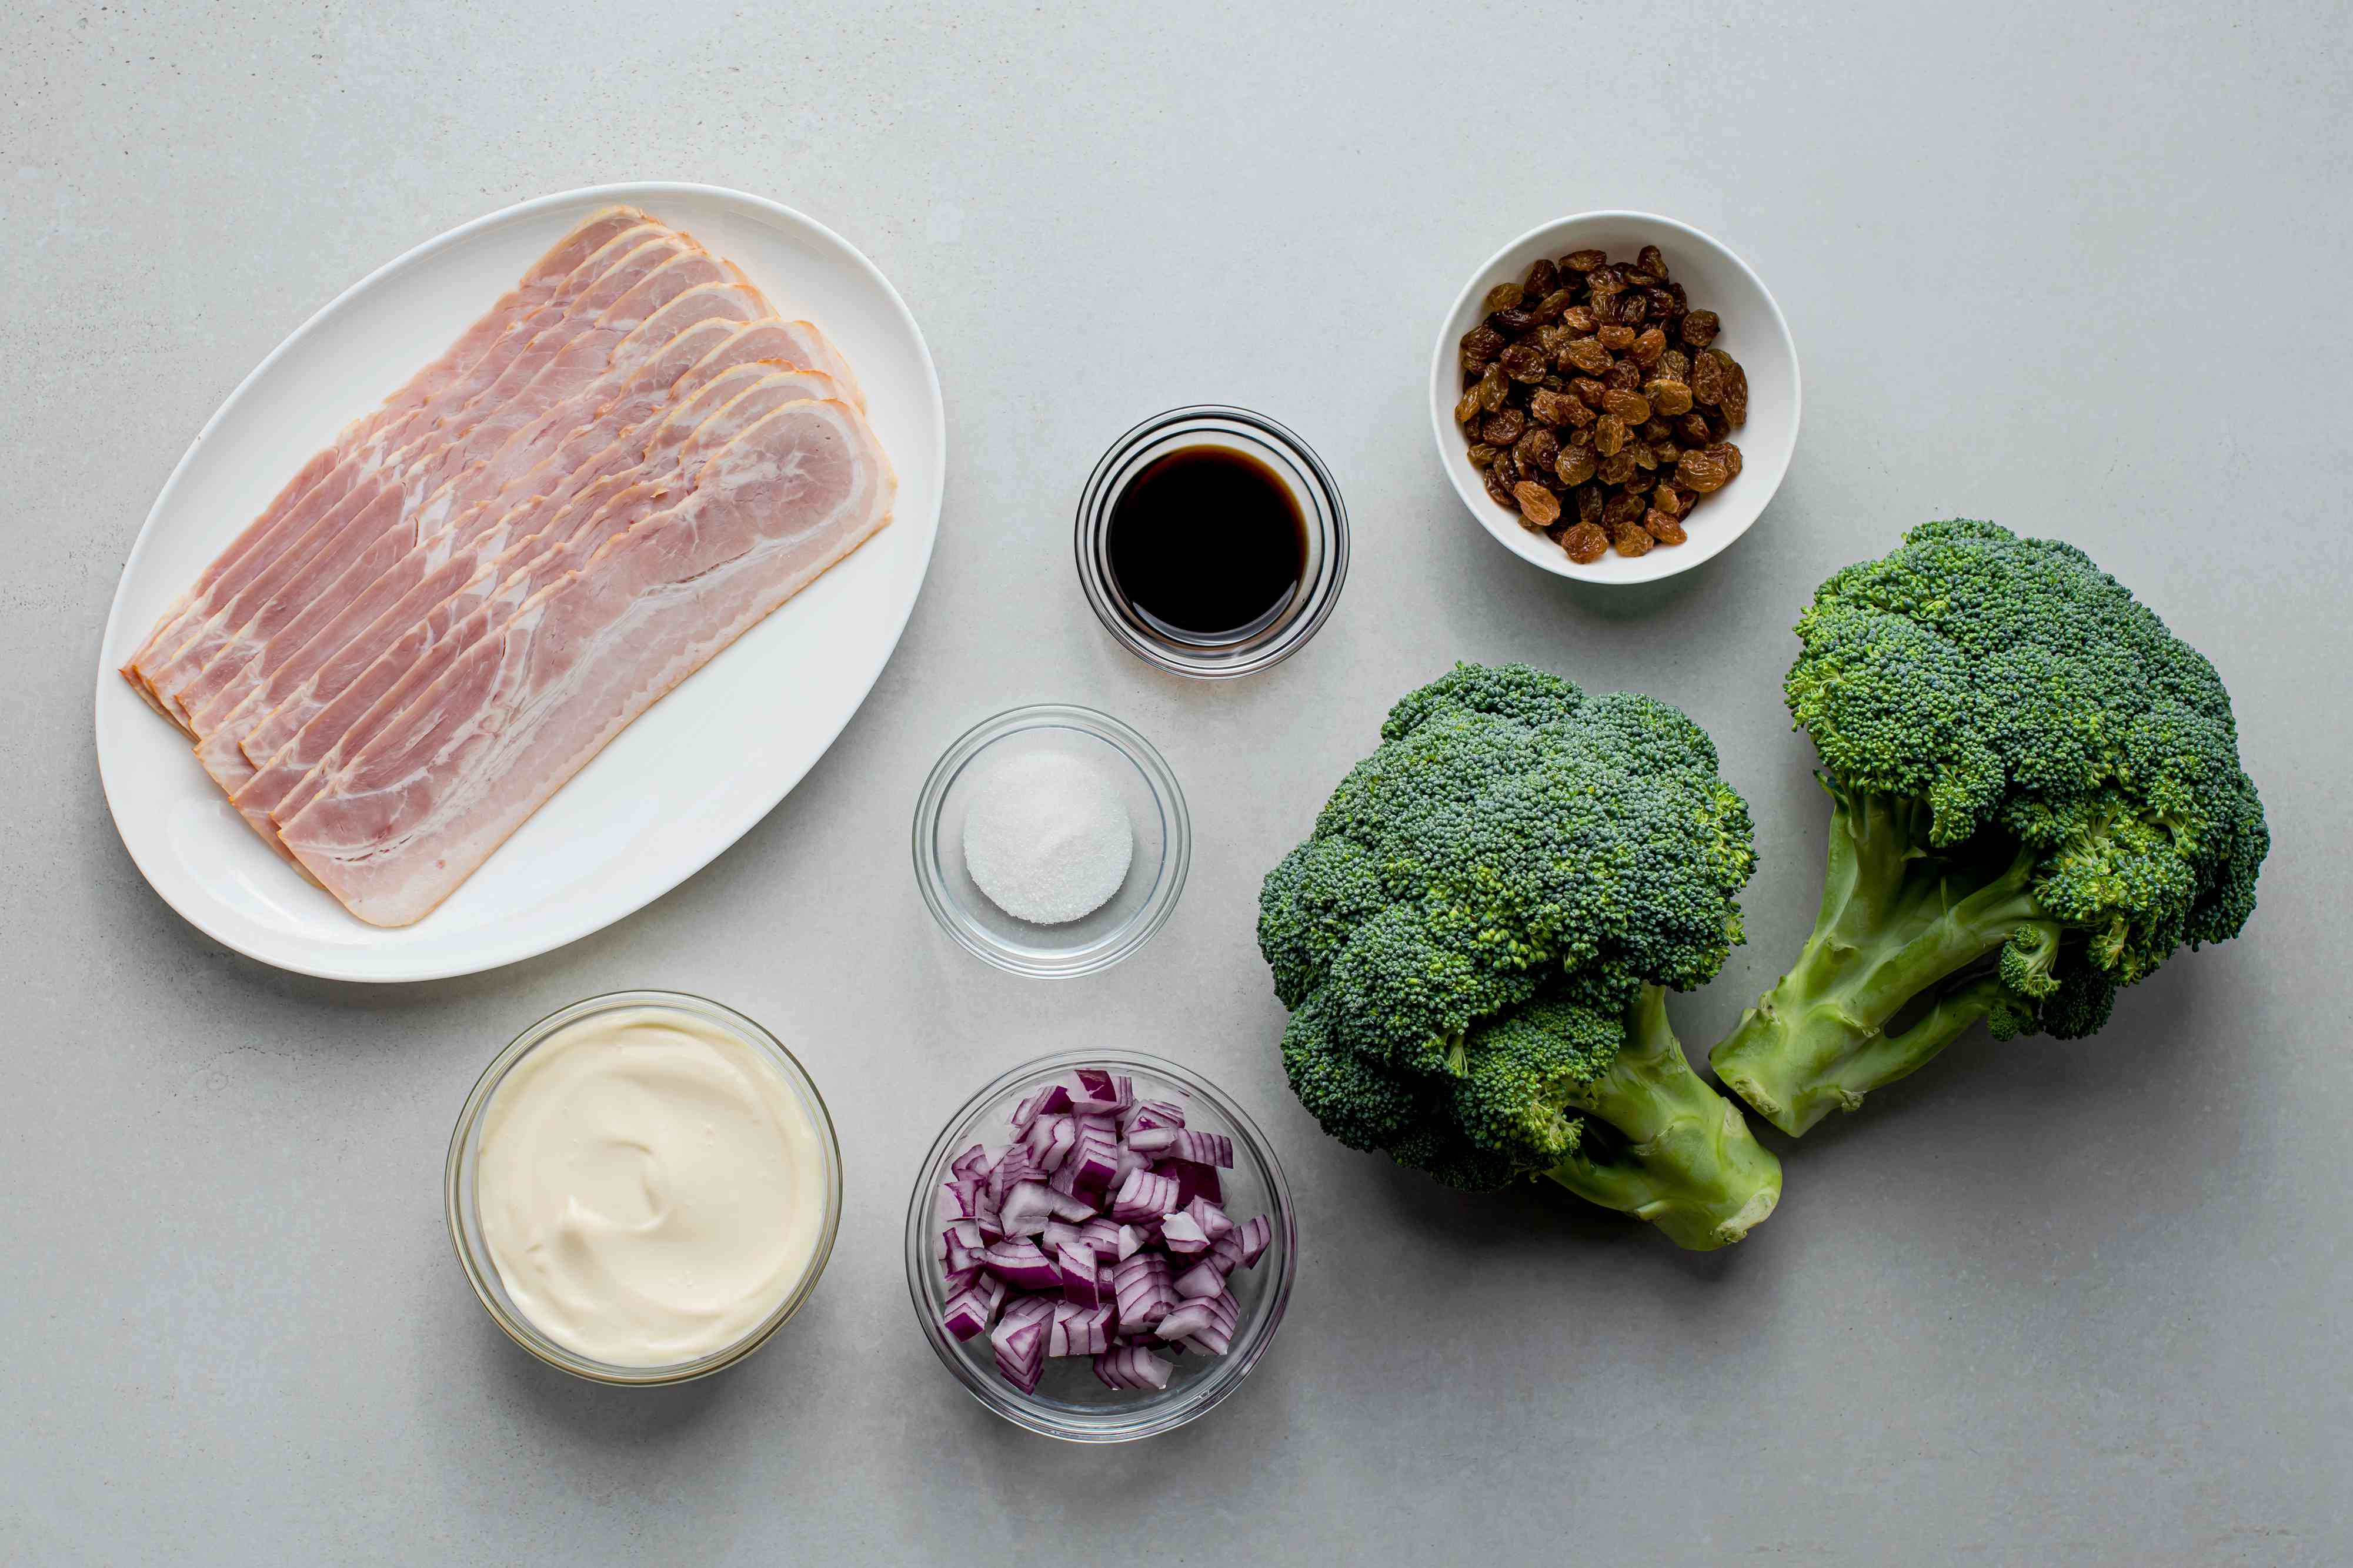 Broccoli Bacon Salad ingredients